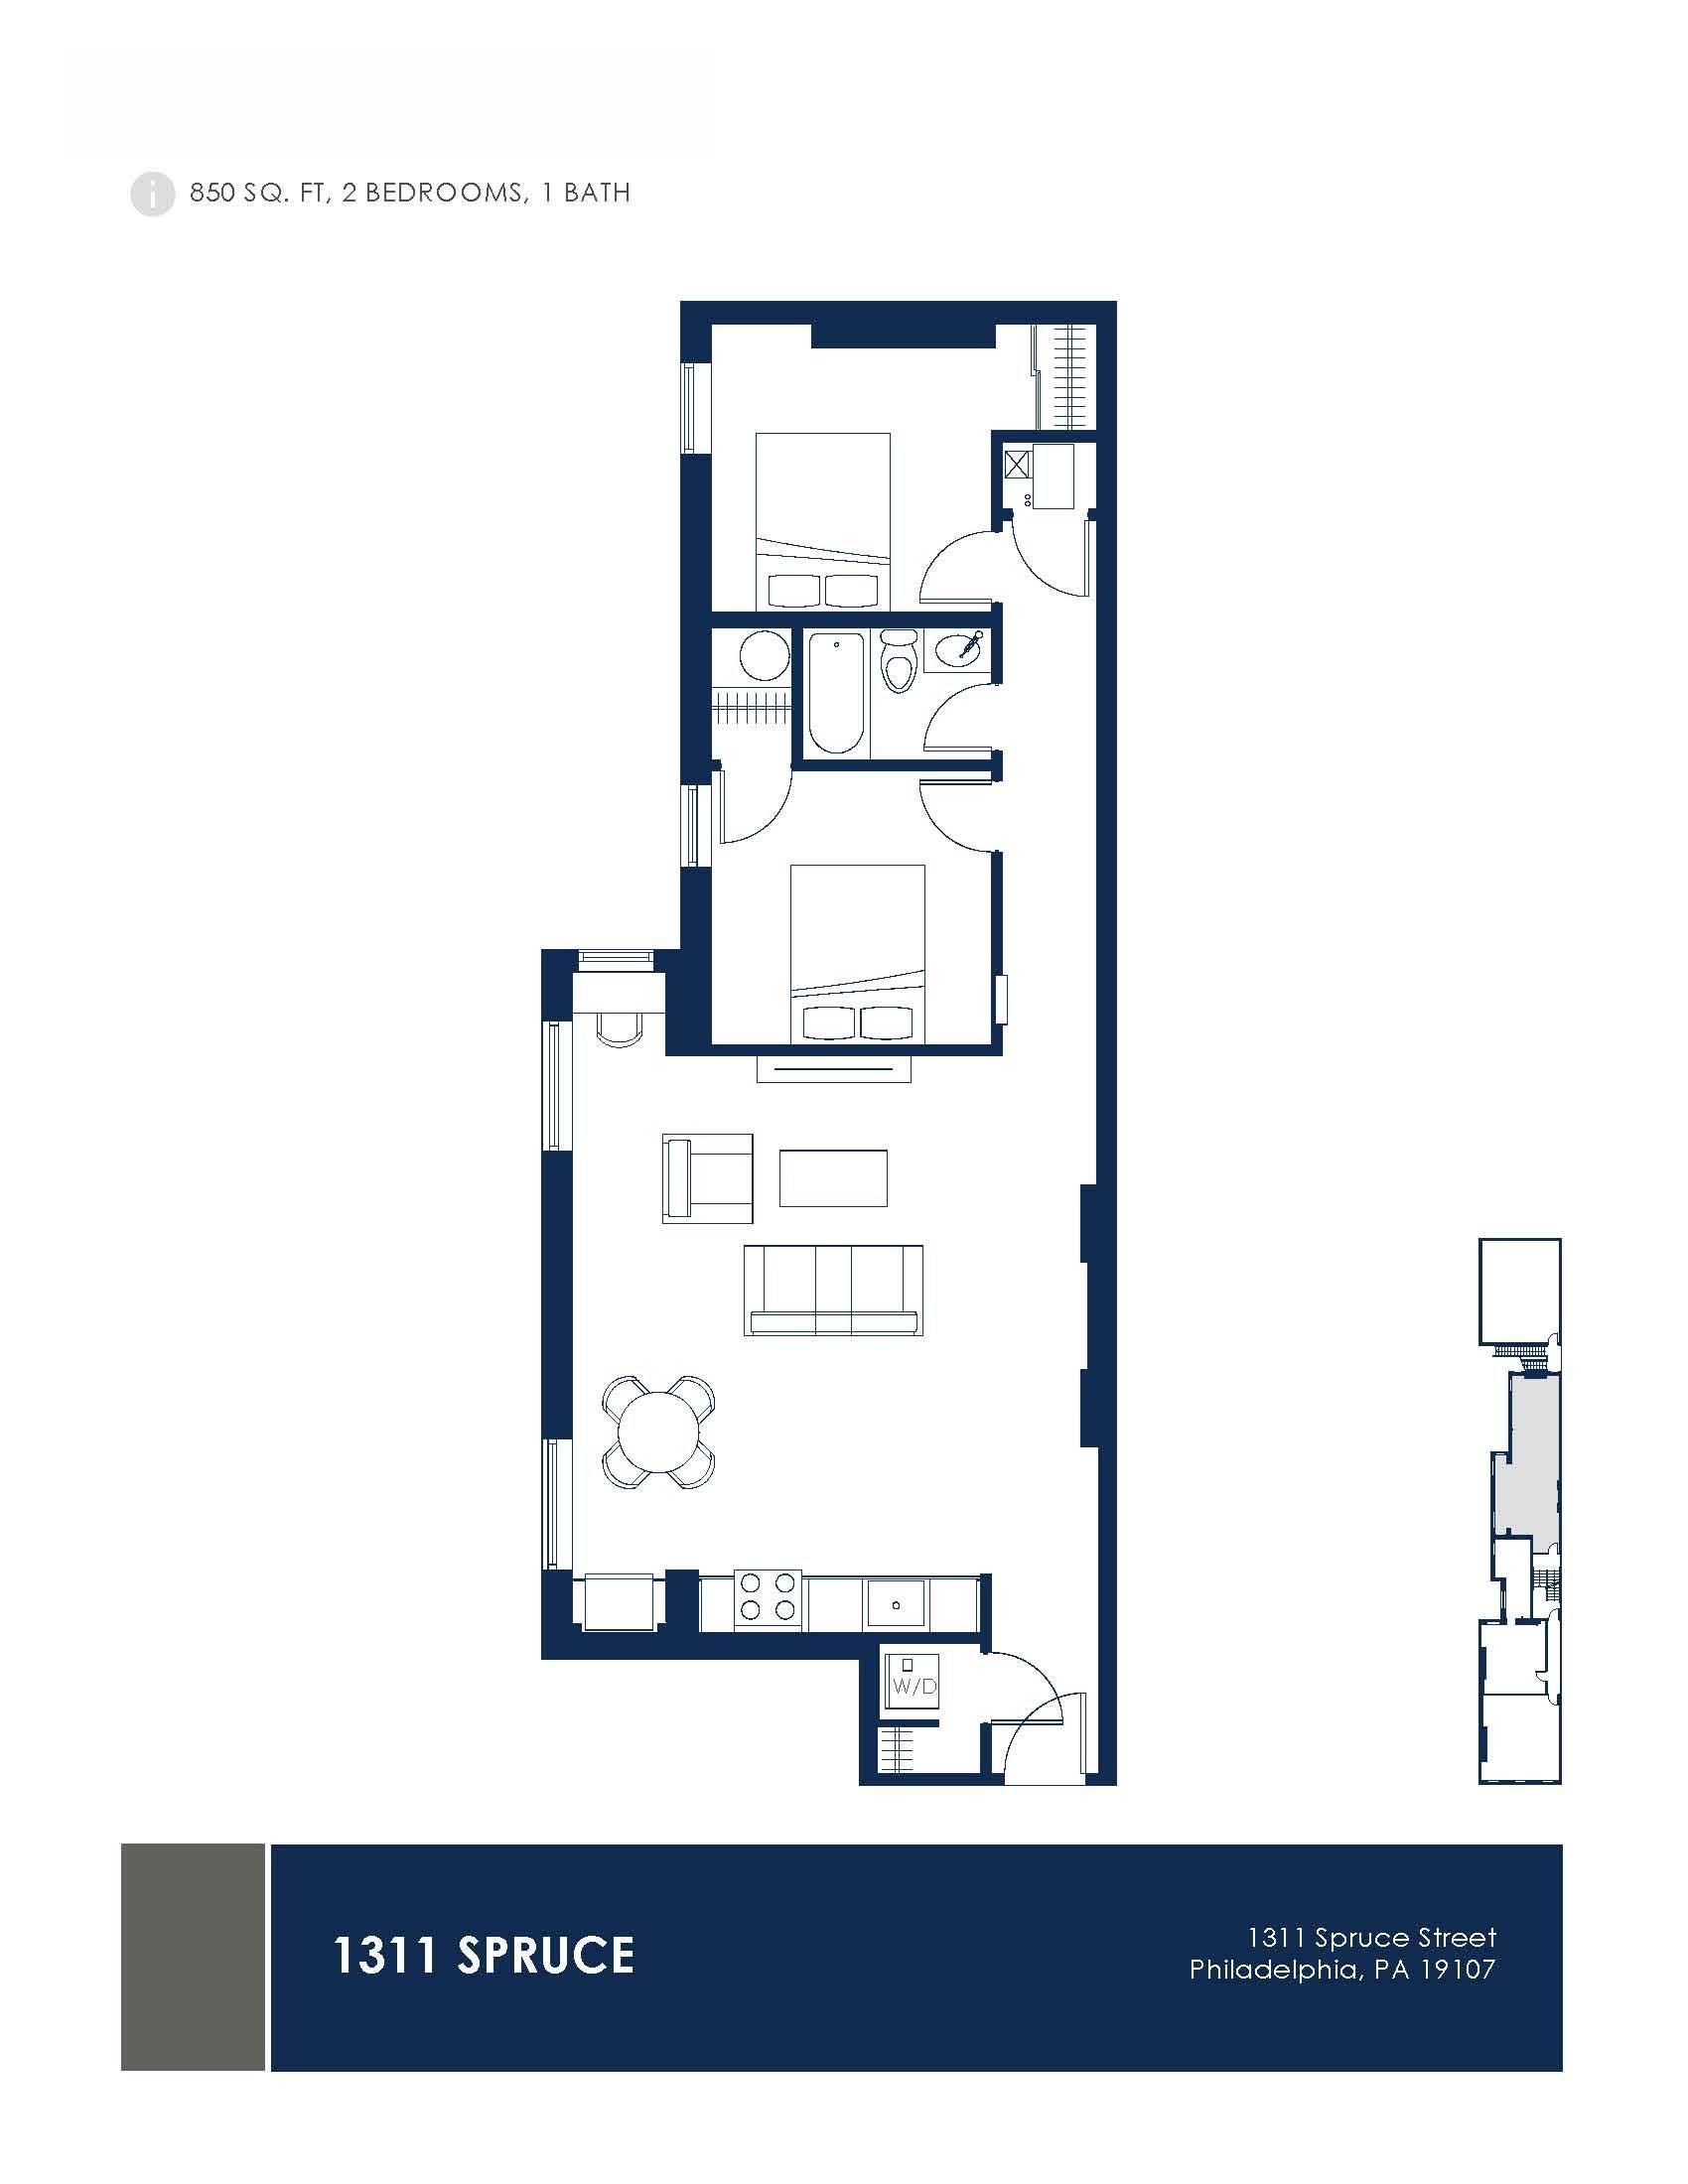 1311 Spruce Street Lofts Floor Plans